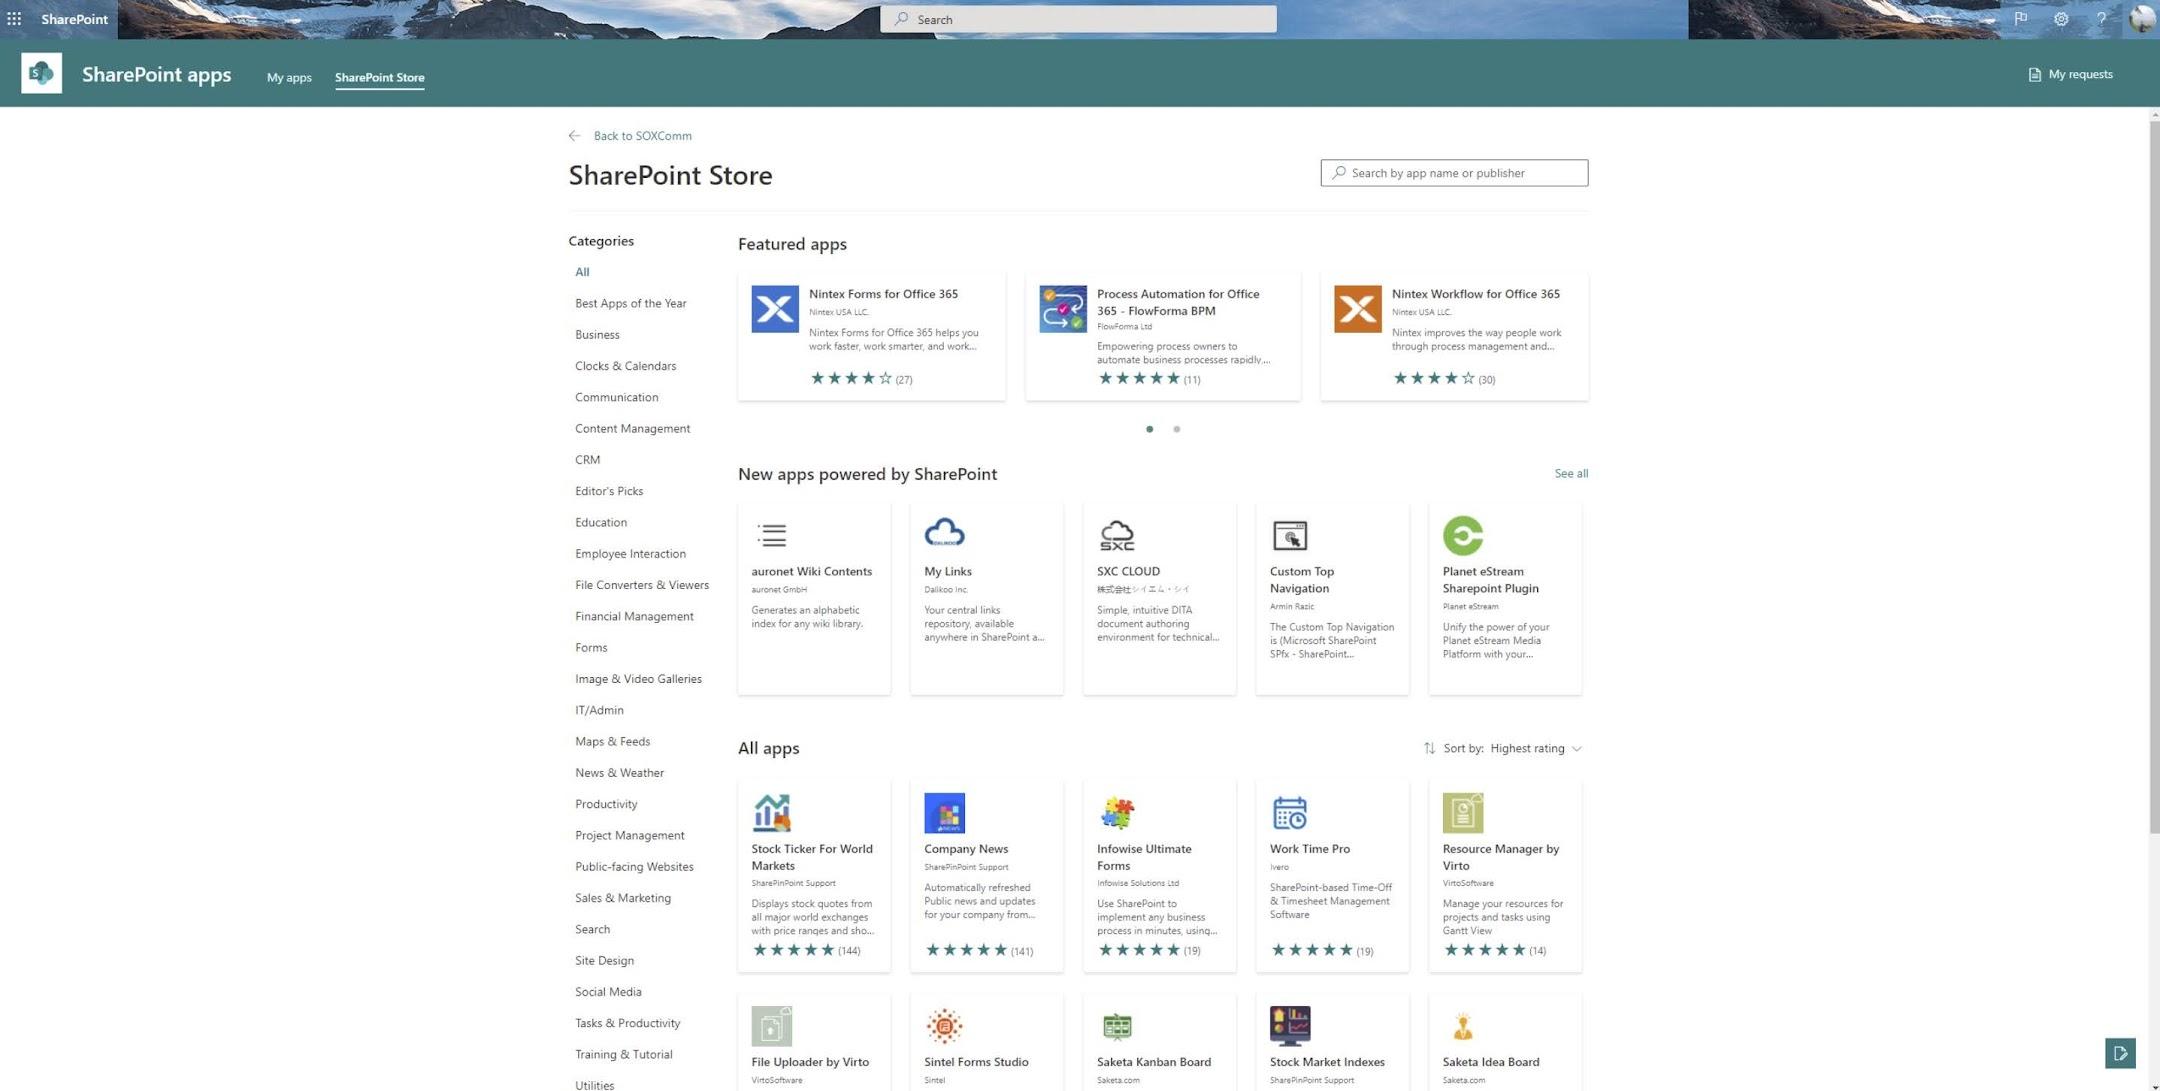 SharePoint Store Homepage